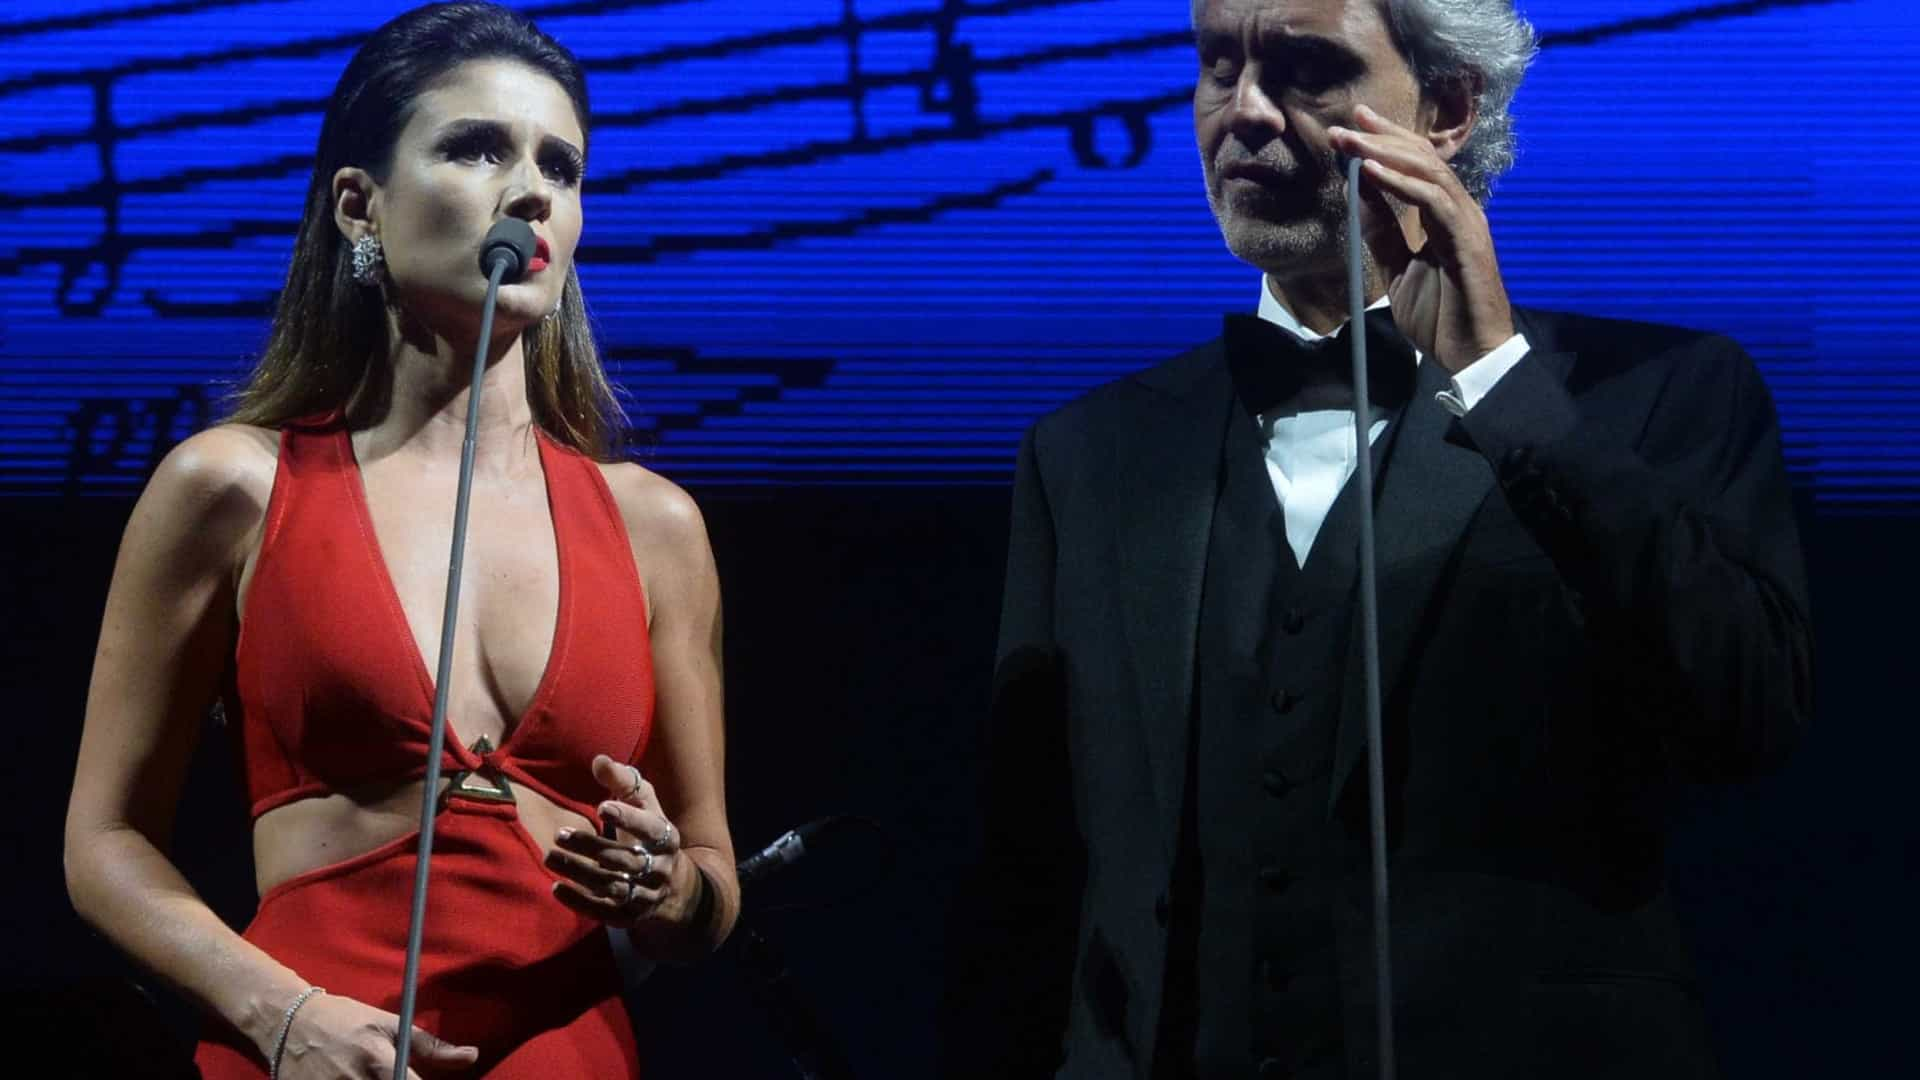 Errou feio! Paula Fernandes dá  vexame  ao cantar com Andrea Bocelli